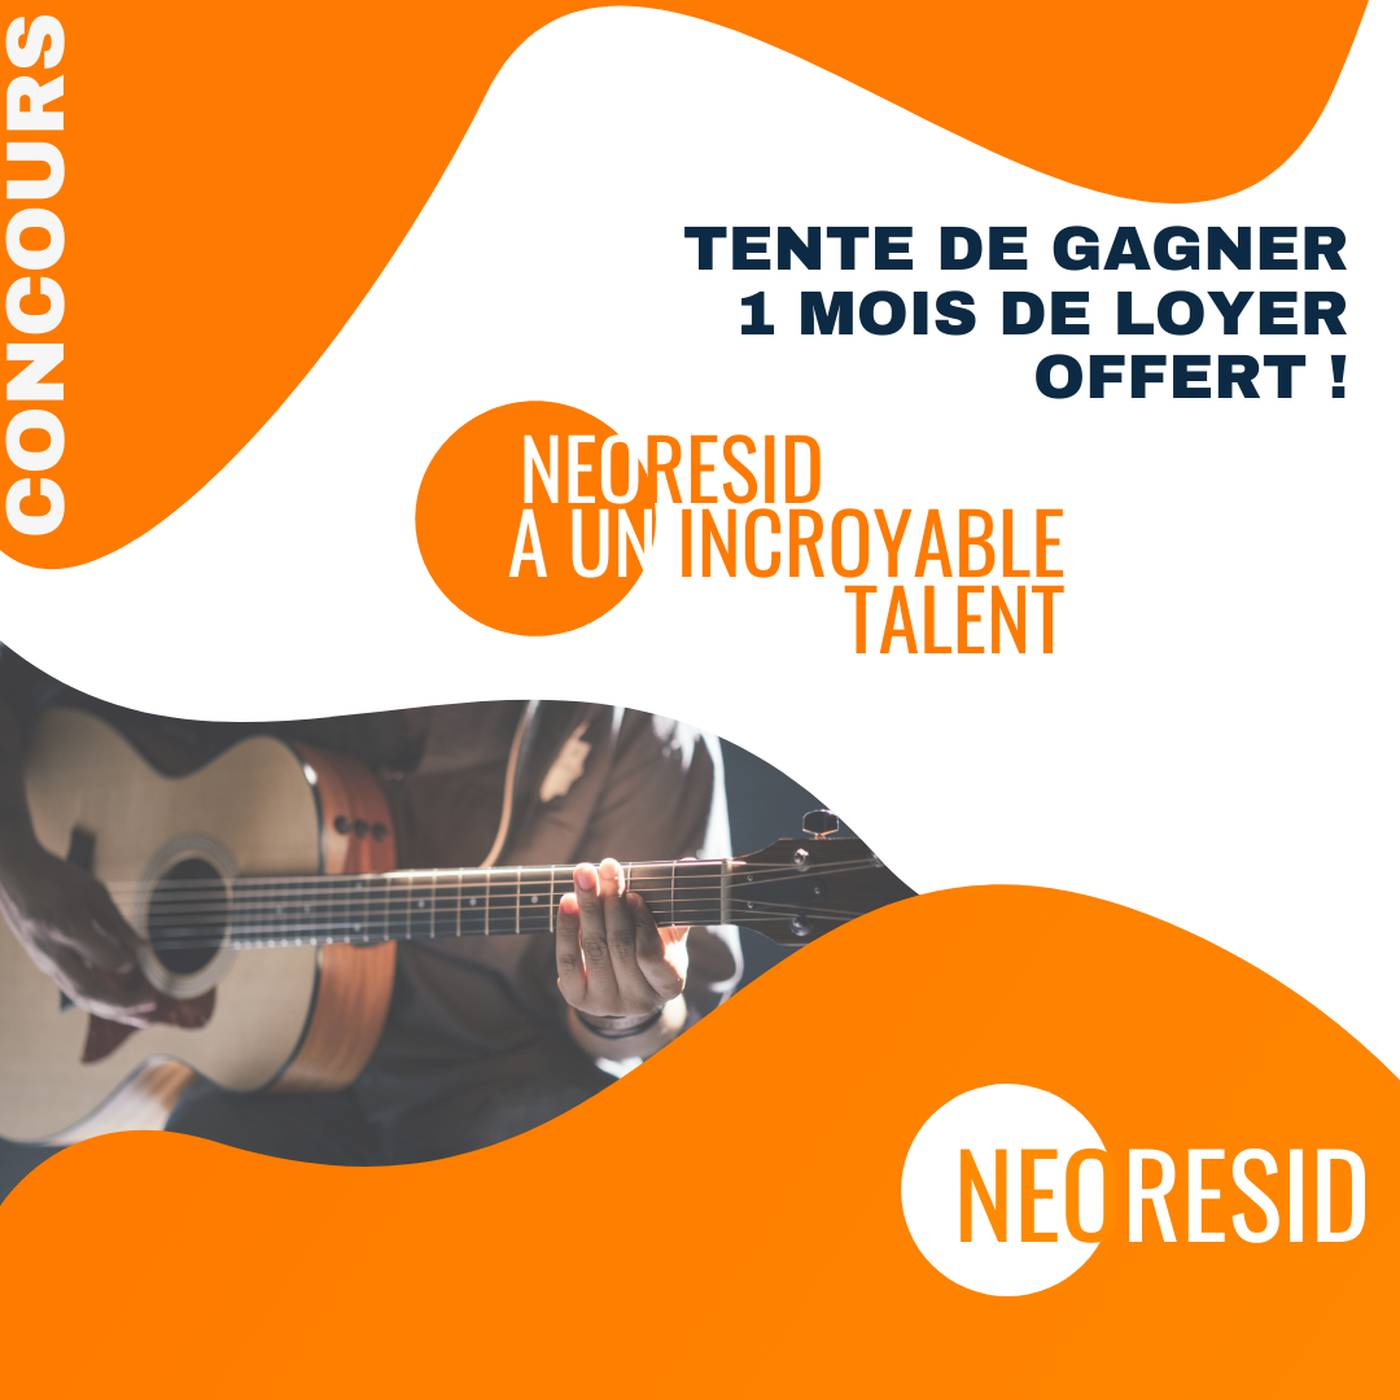 Neoresid a un incroyable talent